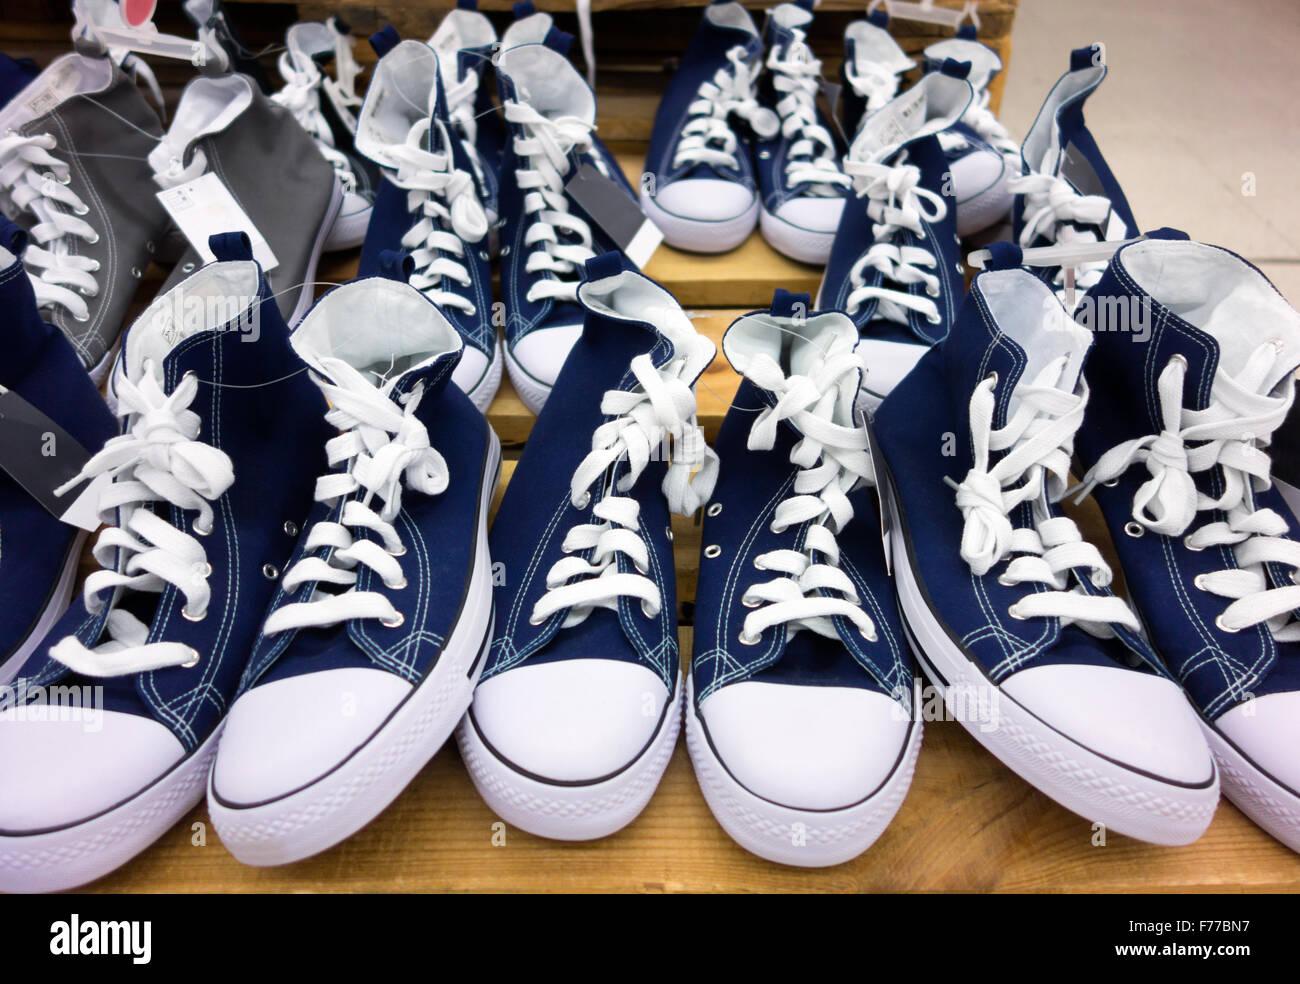 Stock Immagini Store Alamy Shoe amp; Fotos Converse H7SAq